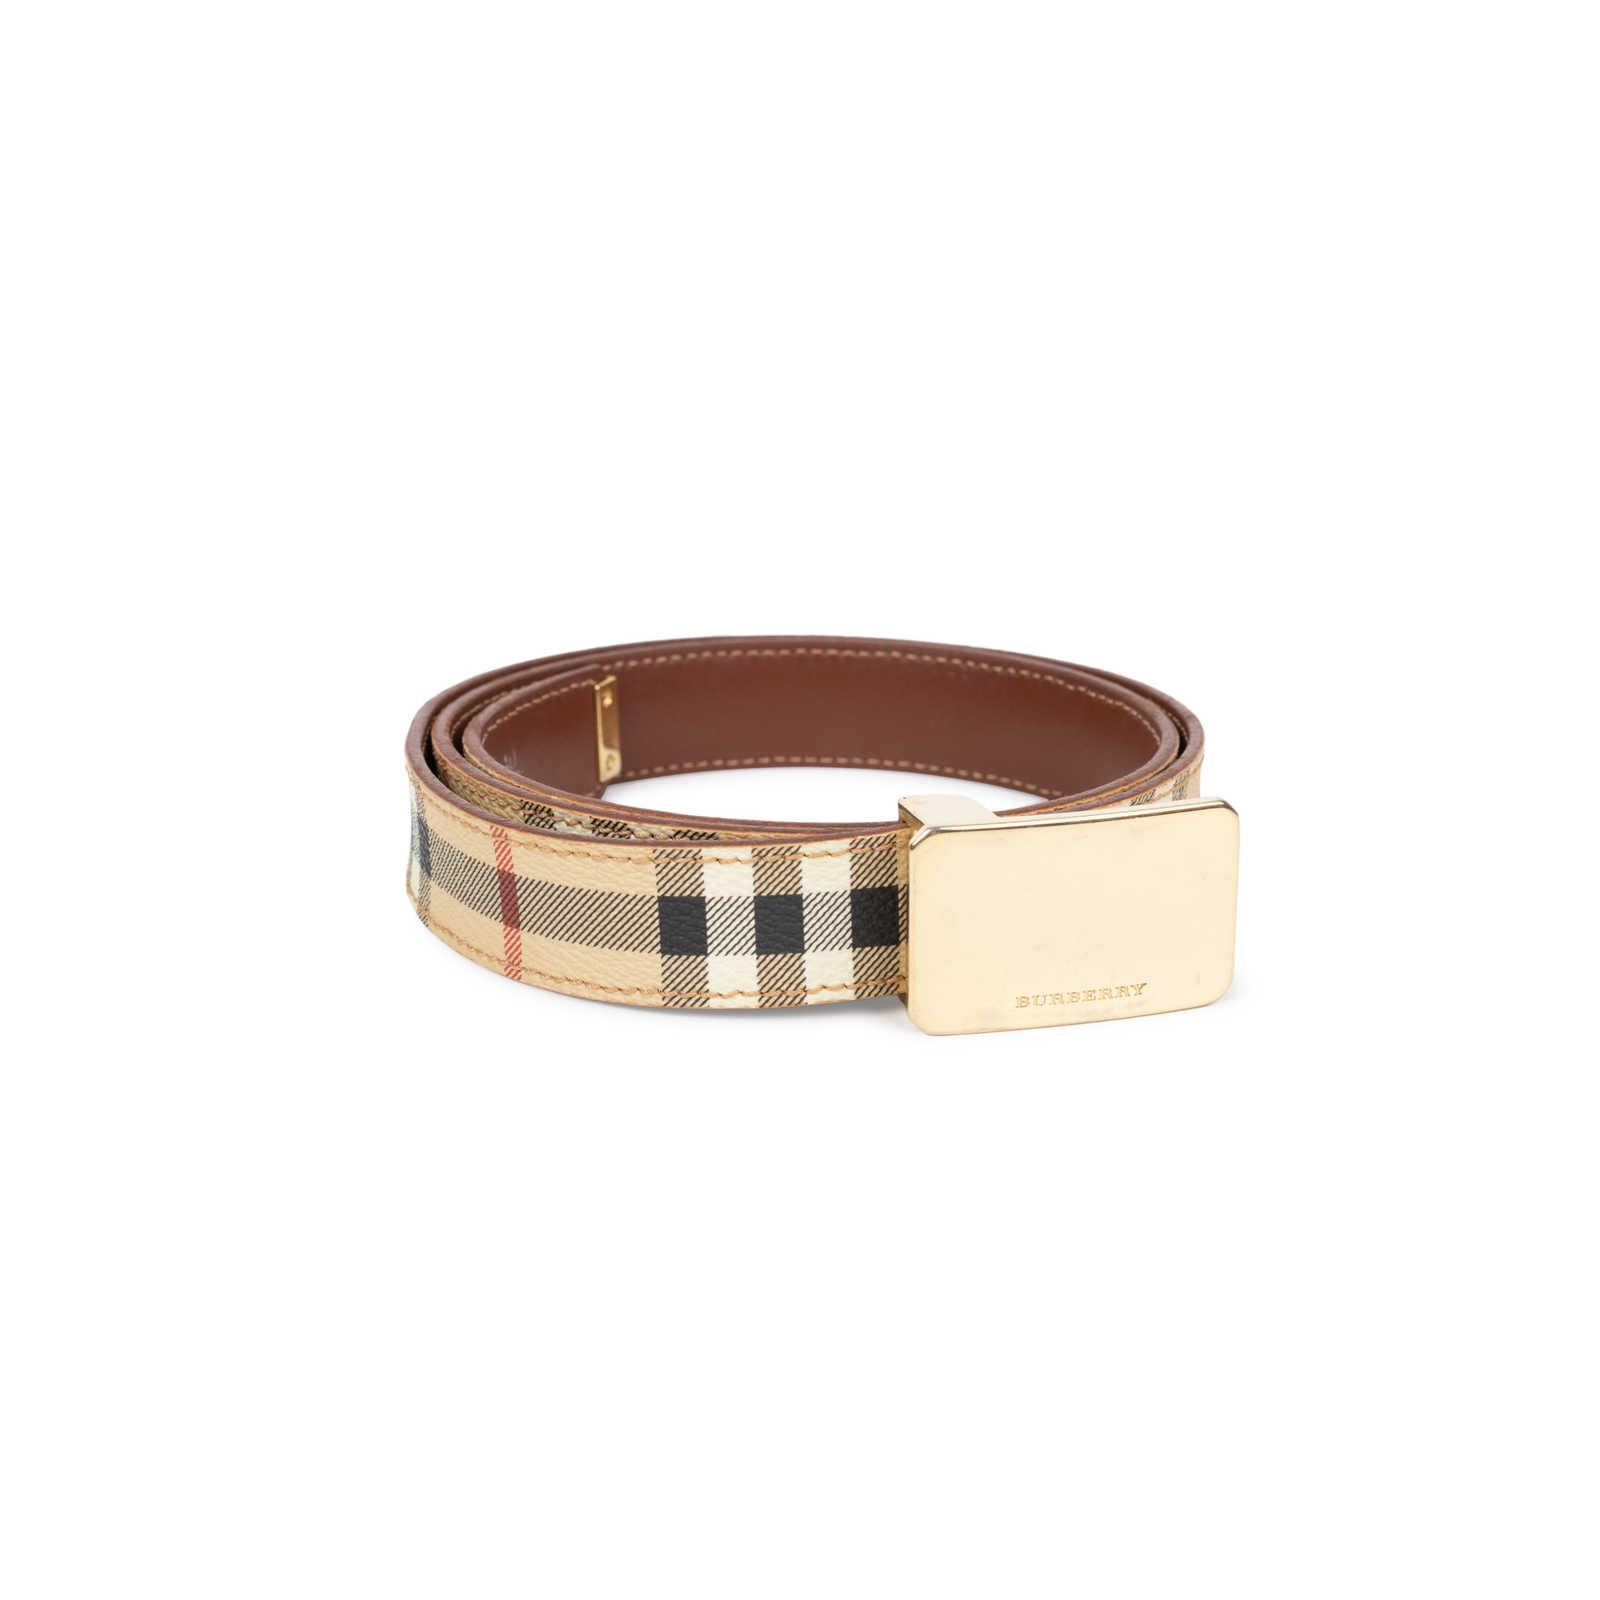 ... Authentic Second Hand Burberry Haymarket Check Belt (PSS-583-00001) -  Thumbnail ... 35db444f592c4